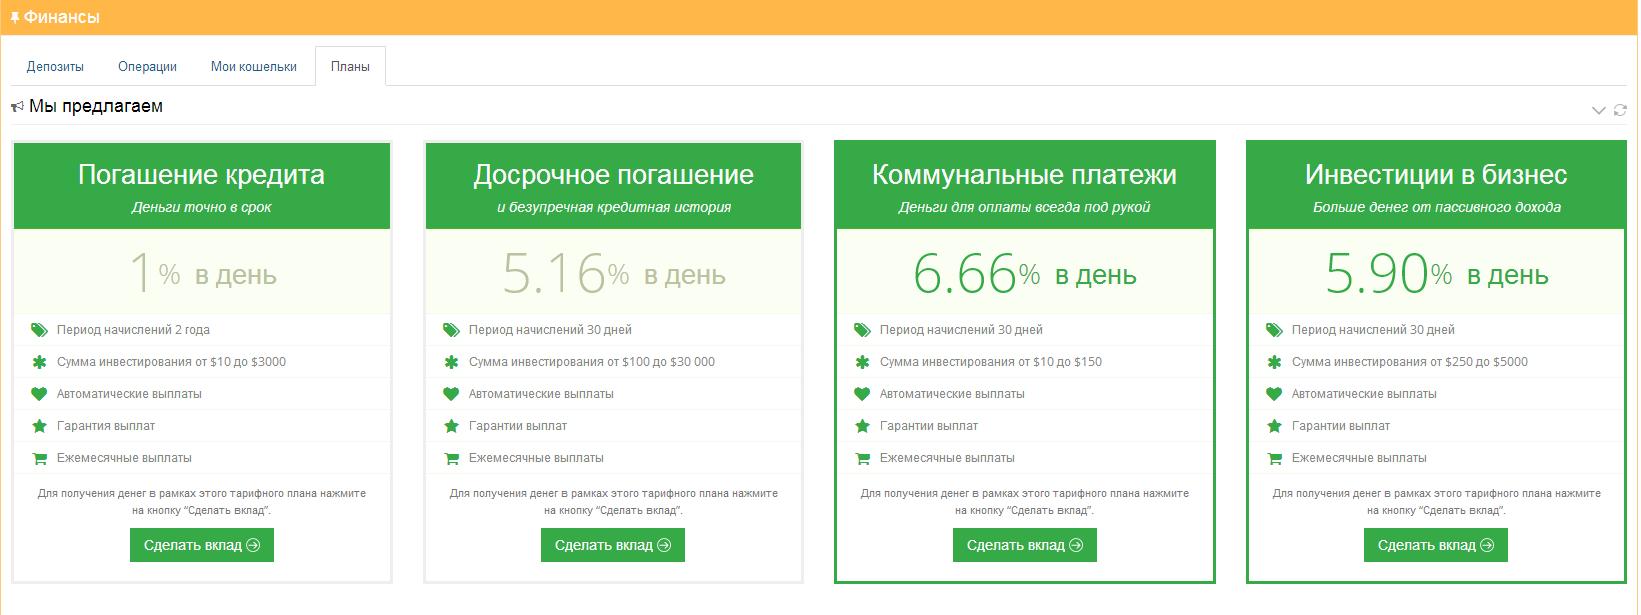 http://4put.ru/pictures/max/861/2647925.jpg